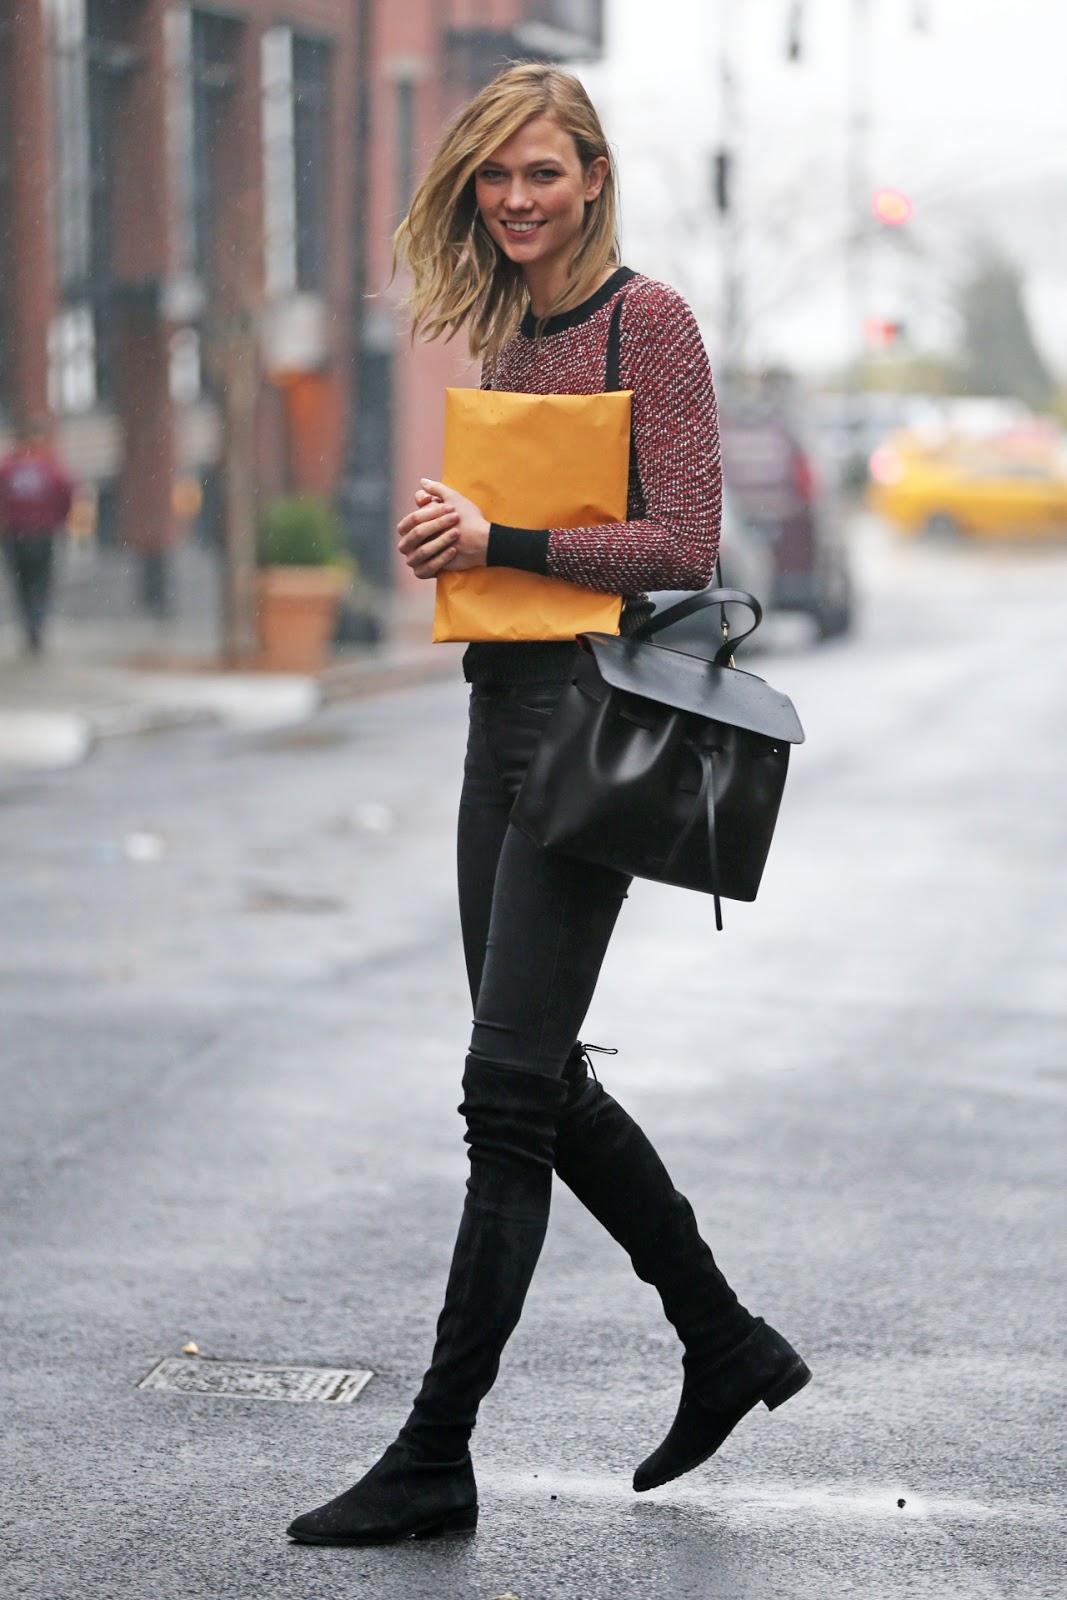 Street Style: Karlie Kloss' Casual Winter Look